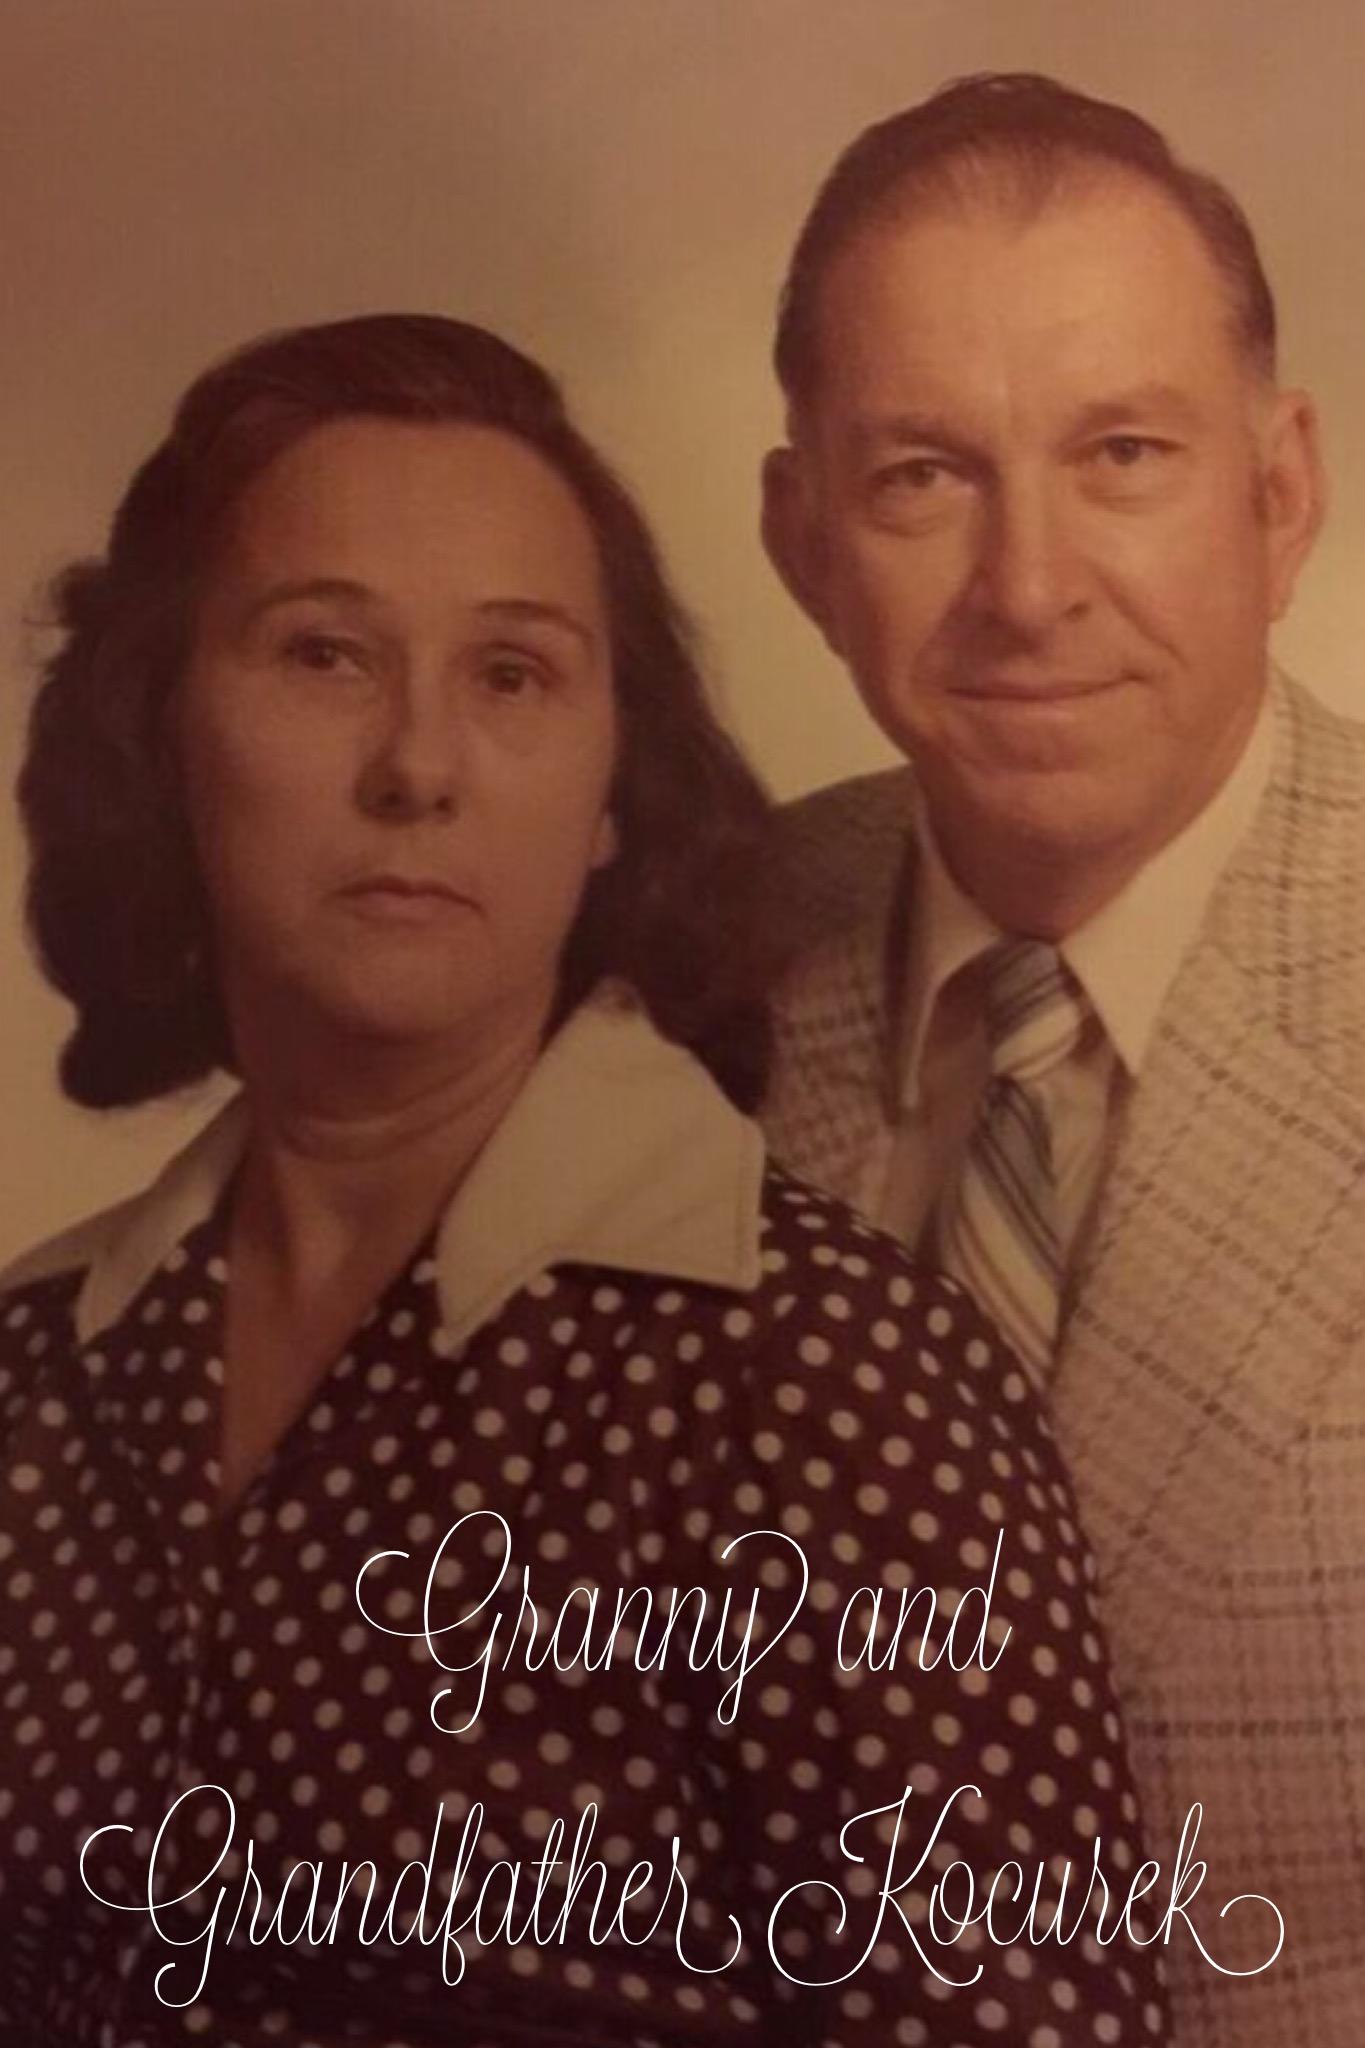 Johnny and Gladys Kocurek